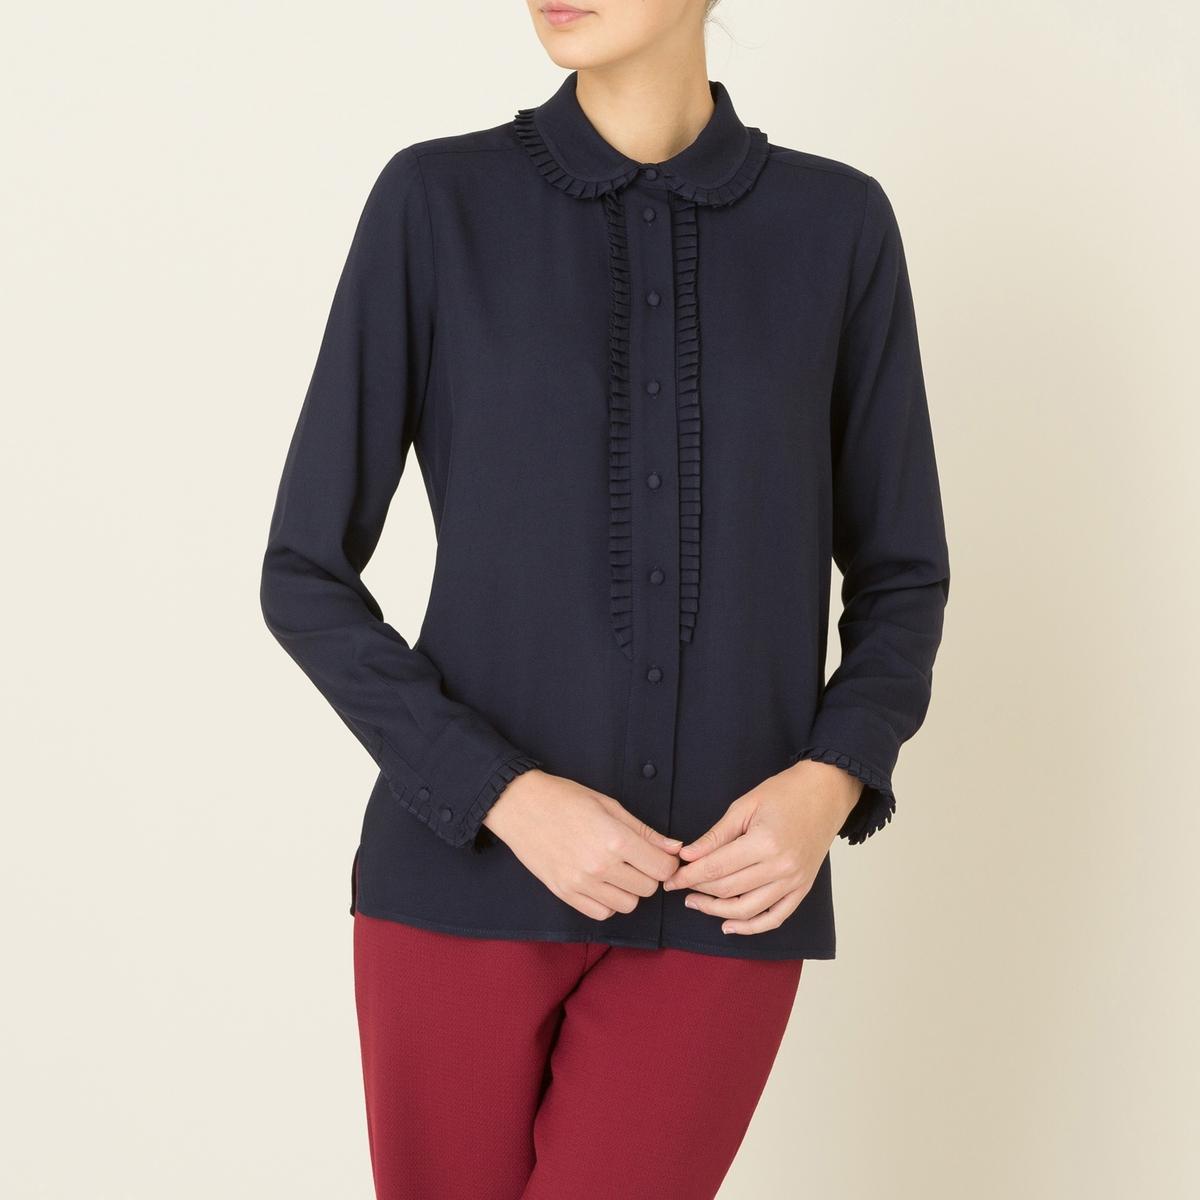 Рубашка PAOLAСостав и описание :Материал : Струящаяся ткань, 100% вискозаМарка : PAUL AND JOE SISTER<br><br>Цвет: темно-синий